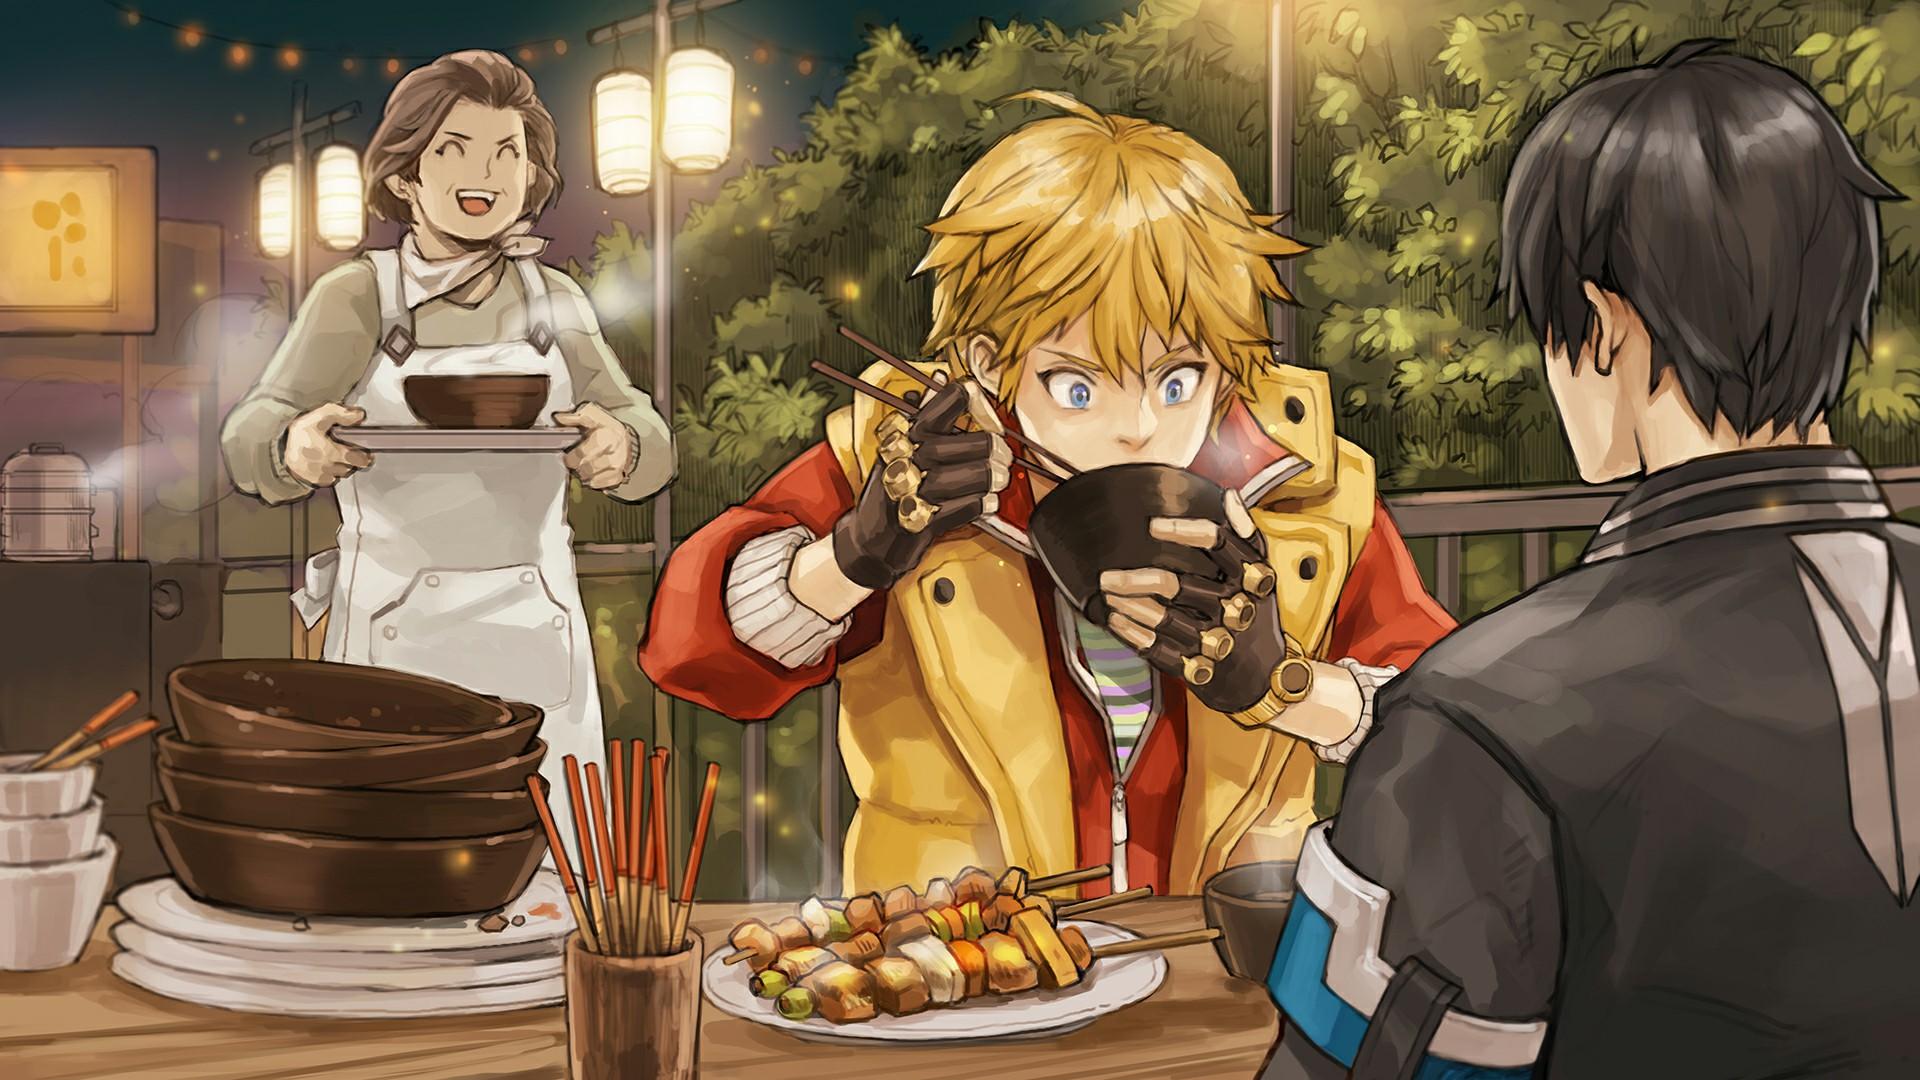 Anime 1920x1080 TROUBLESHOOTER food kebabs blonde Japan waitress bowls chopstick jacket clothes video games black hair dark hair brunette apron trees lights